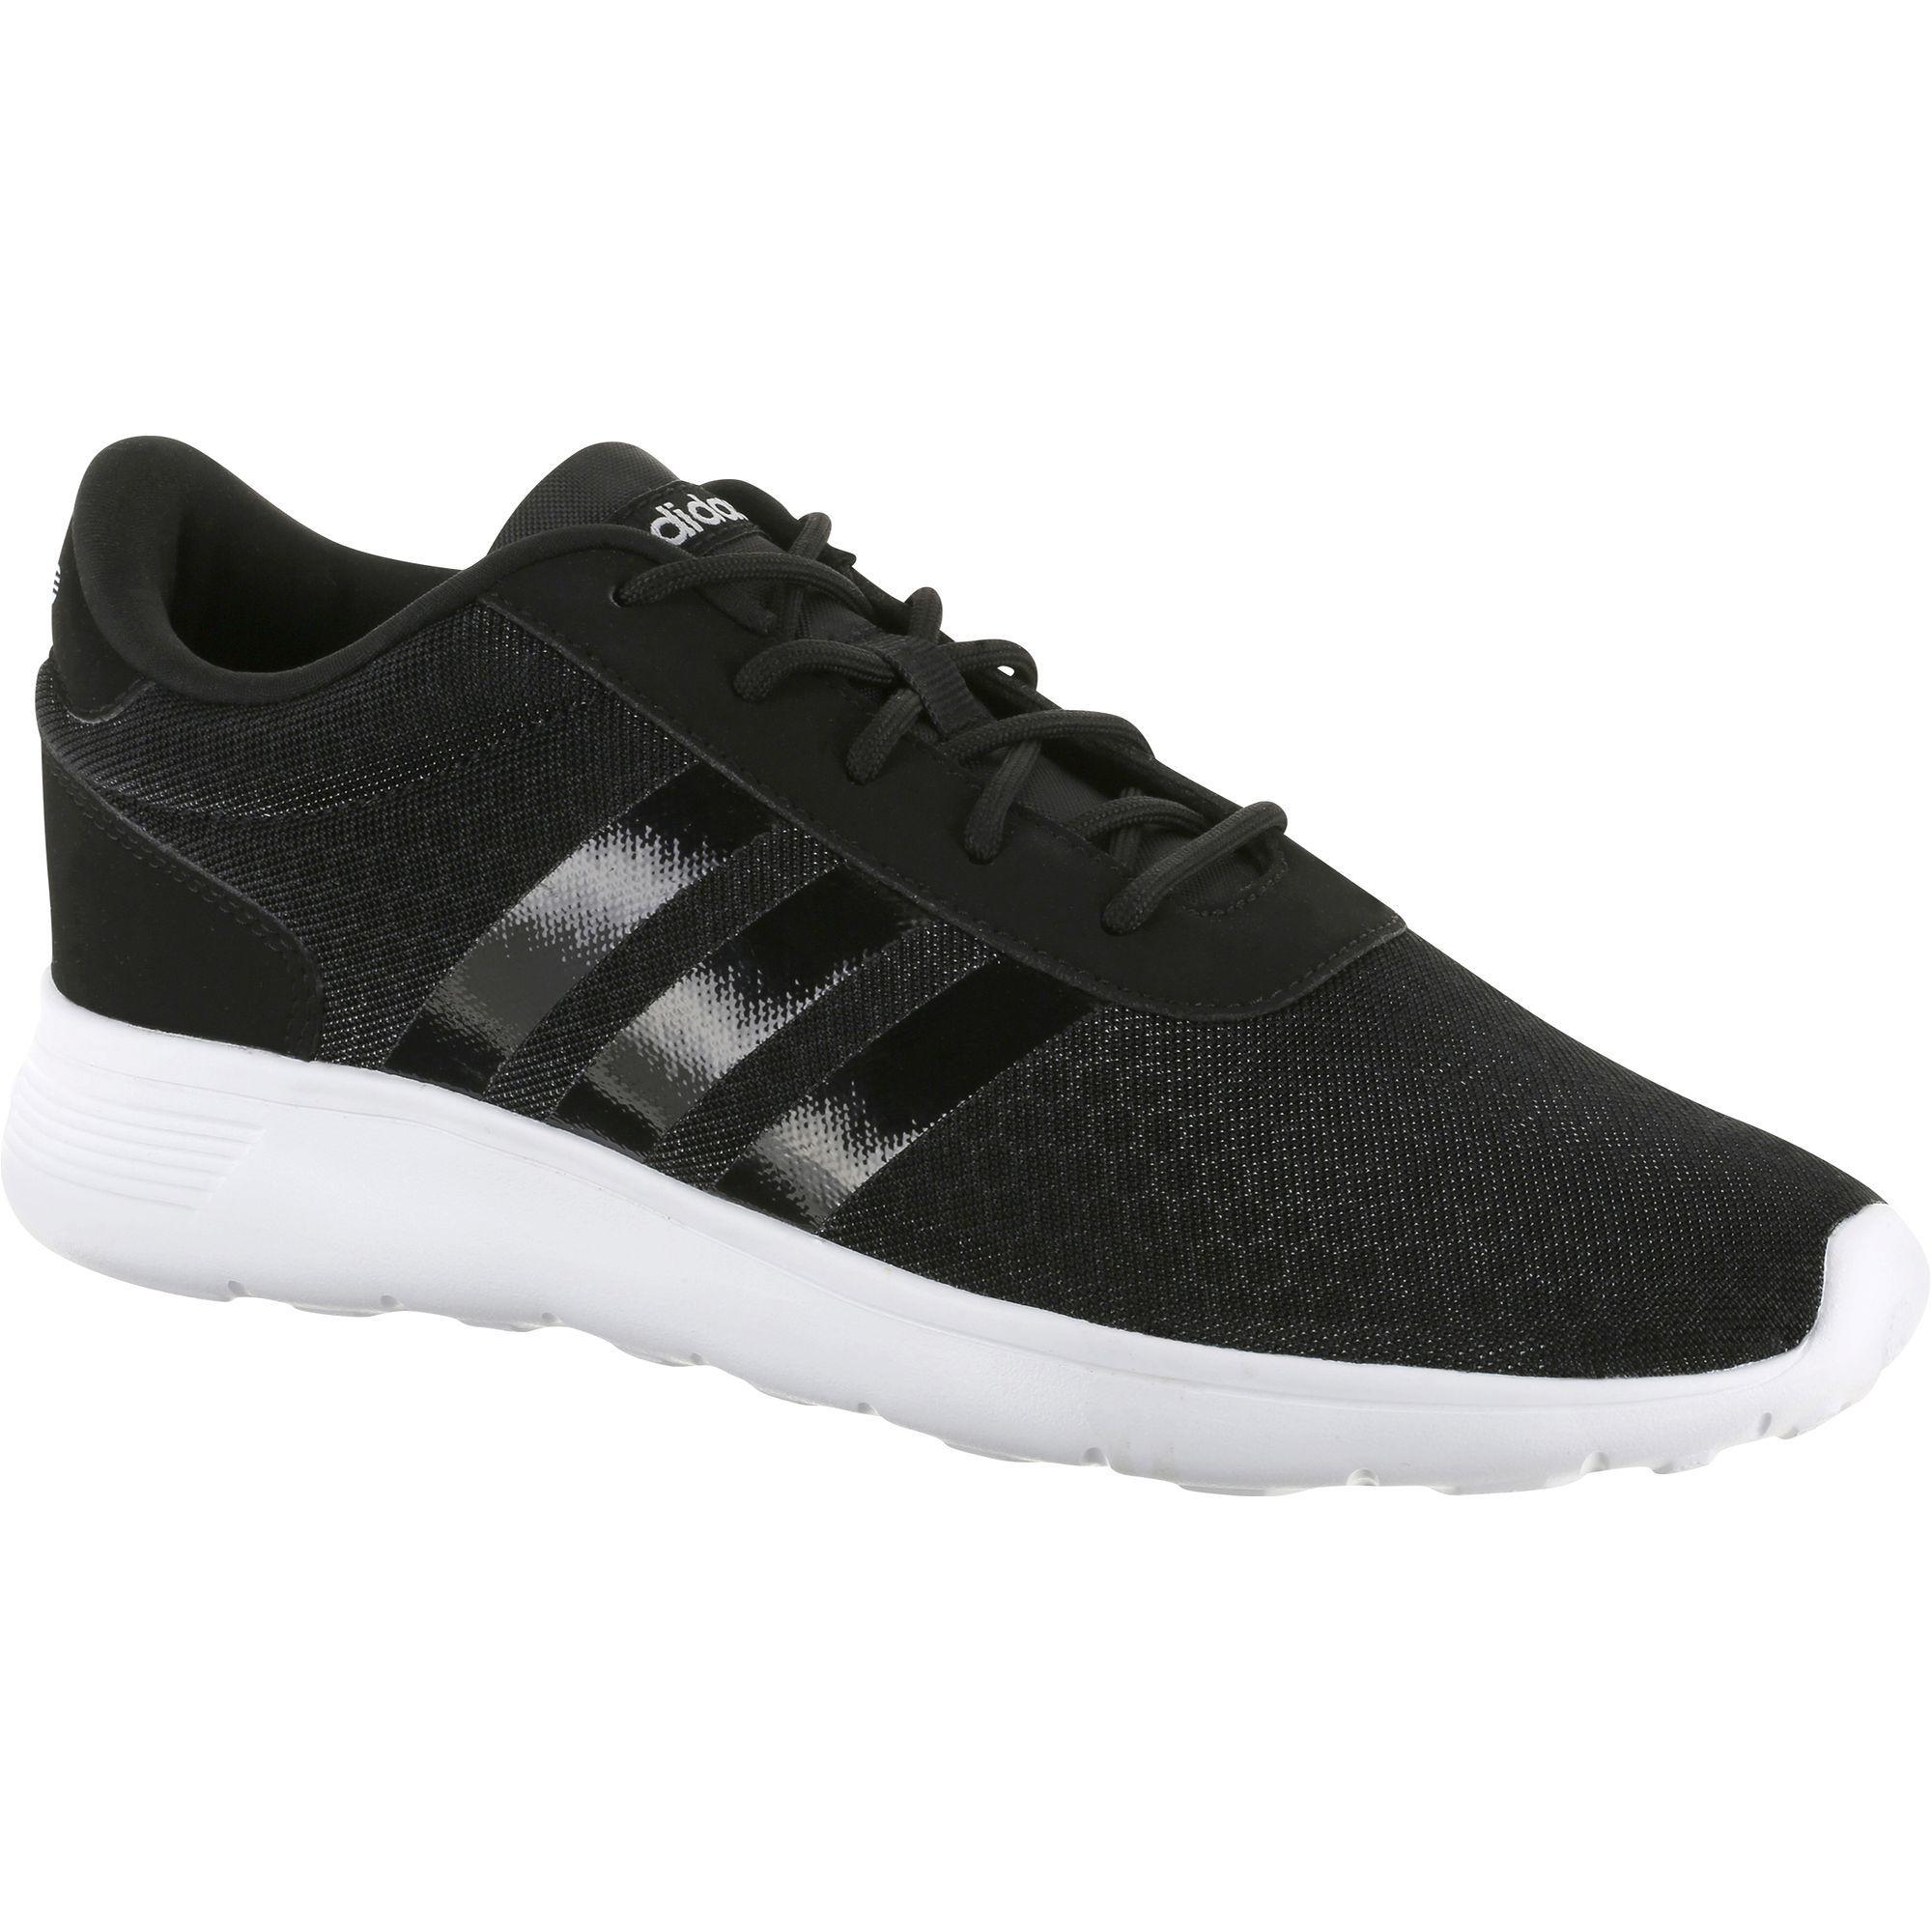 premium selection 8dab7 56413 Adidas Decathlon